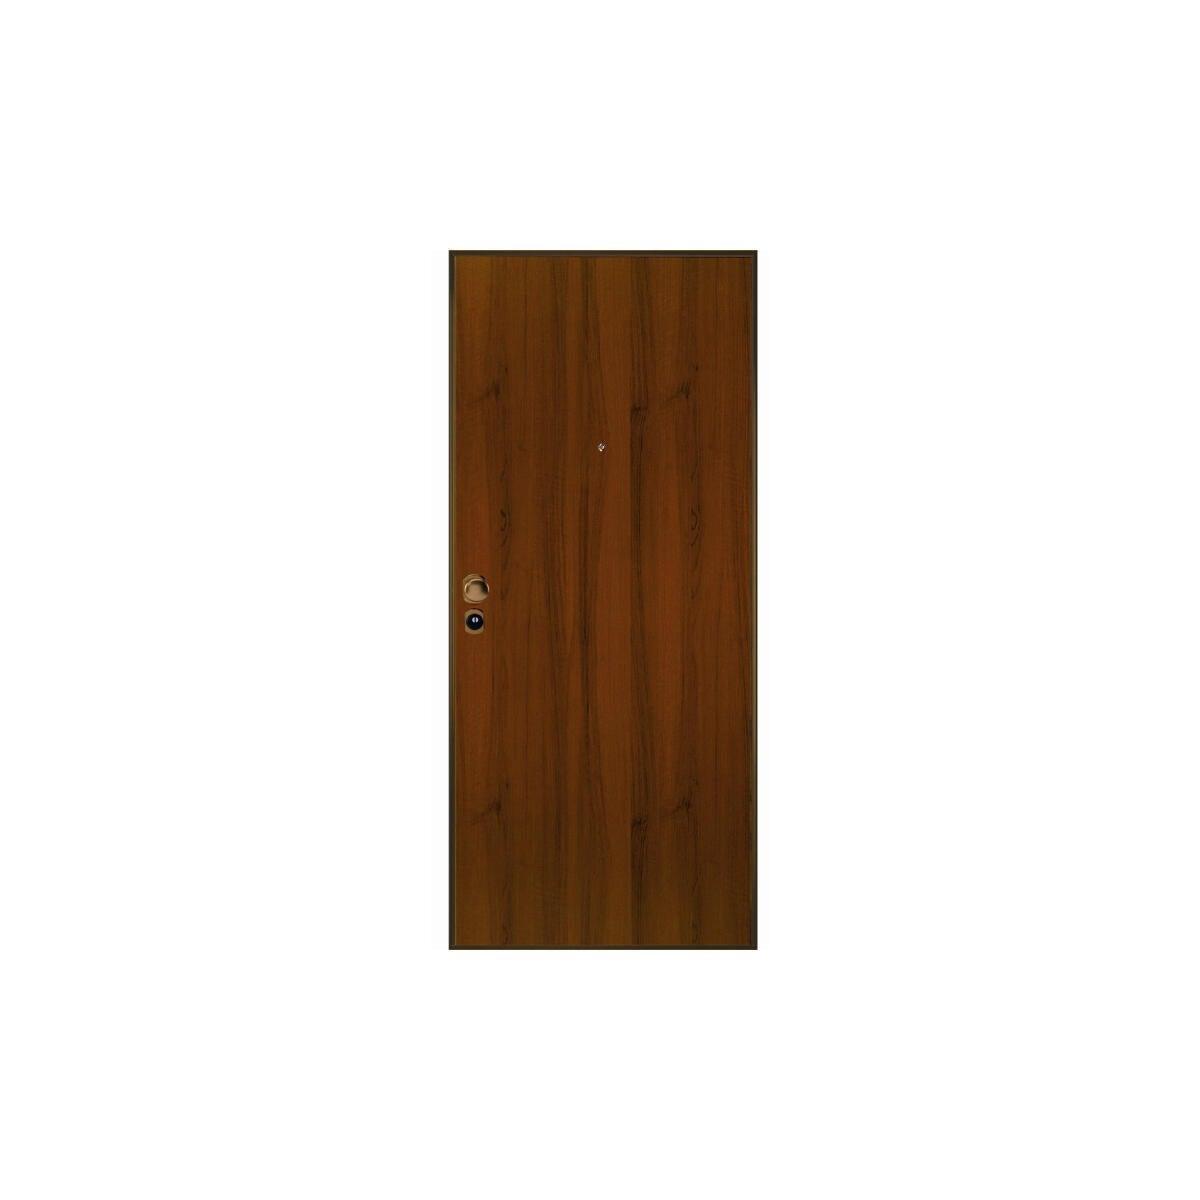 Porta blindata Blocked marrone L 90 x H 210 cm destra - 4